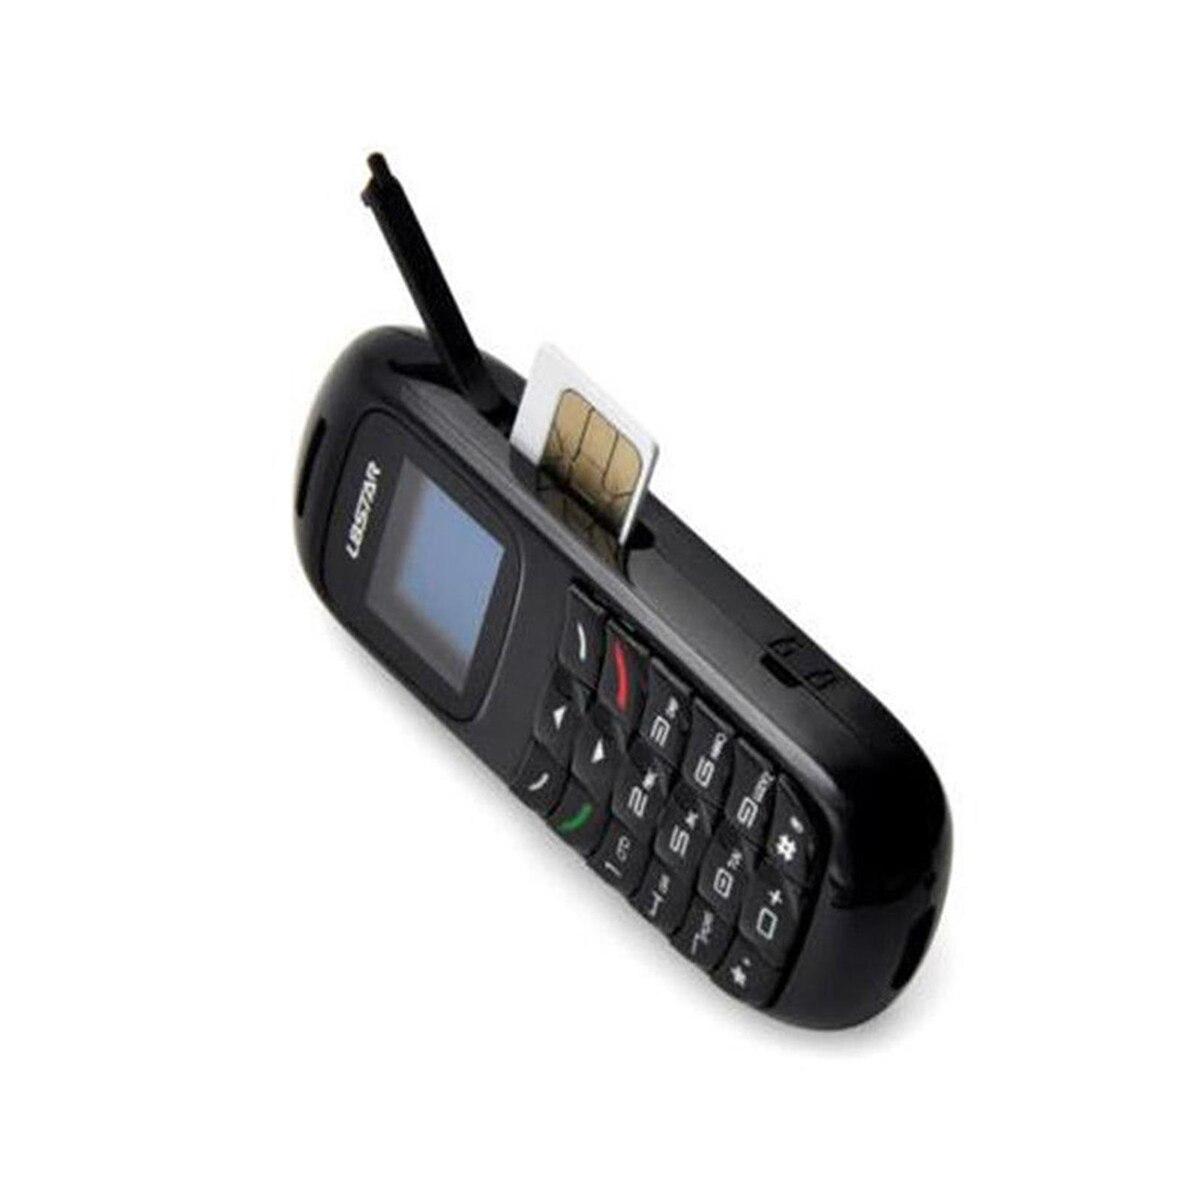 Top Sale╢Earphone Bluetooth Dialer Cell-Phone-Dialer Wireless Bm70 3-In-1 Gt-Star Universal Mini═